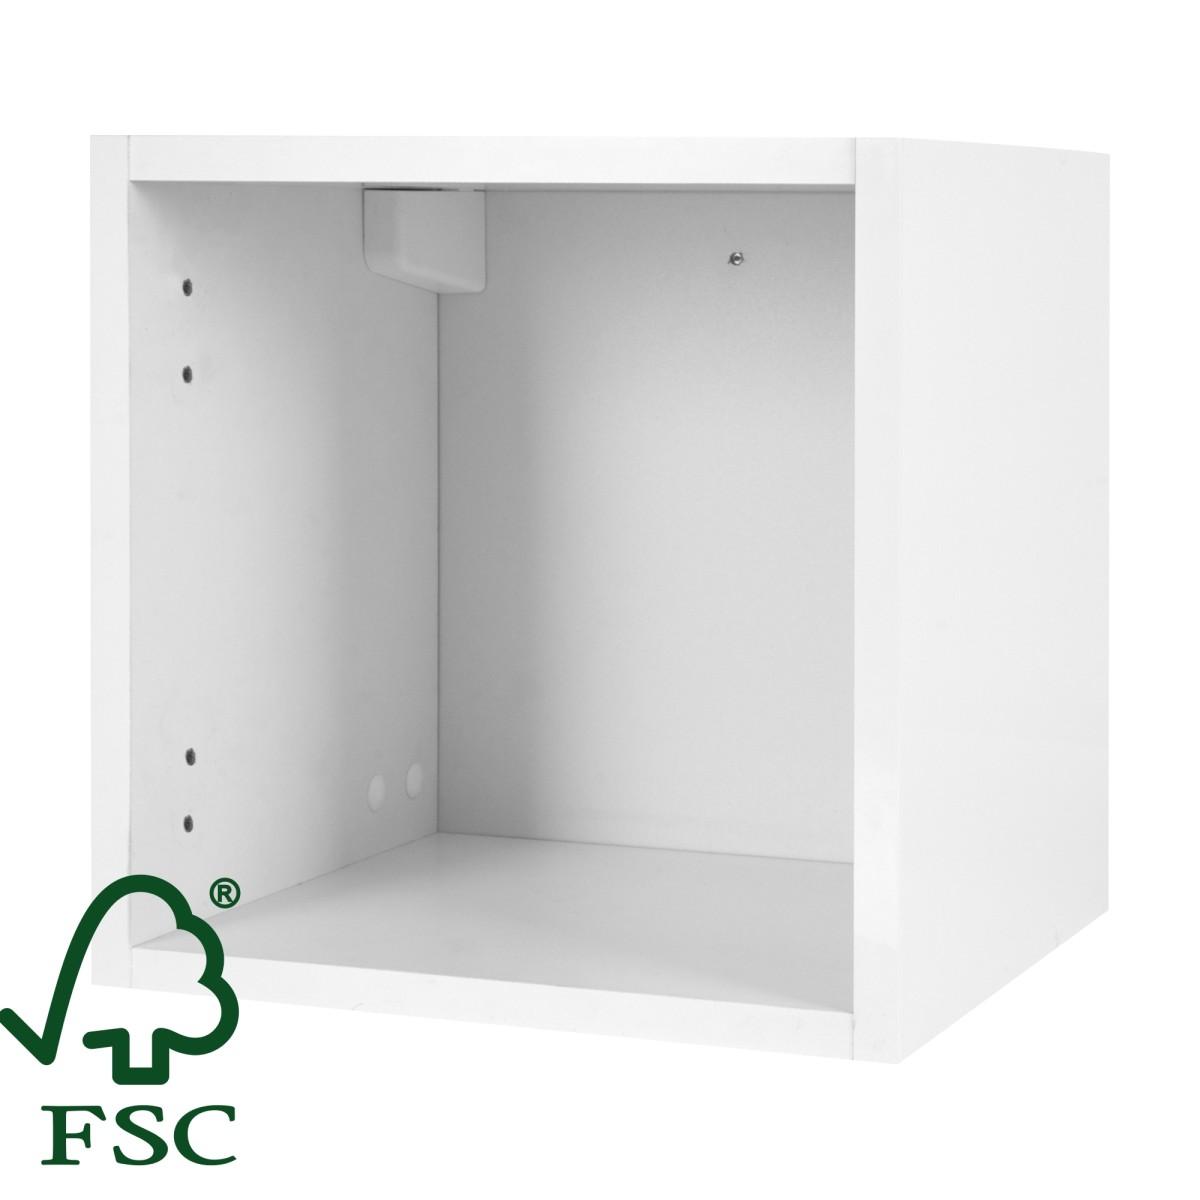 Каркас шкафа подвесного Смарт 30x30х15 см цвет белый